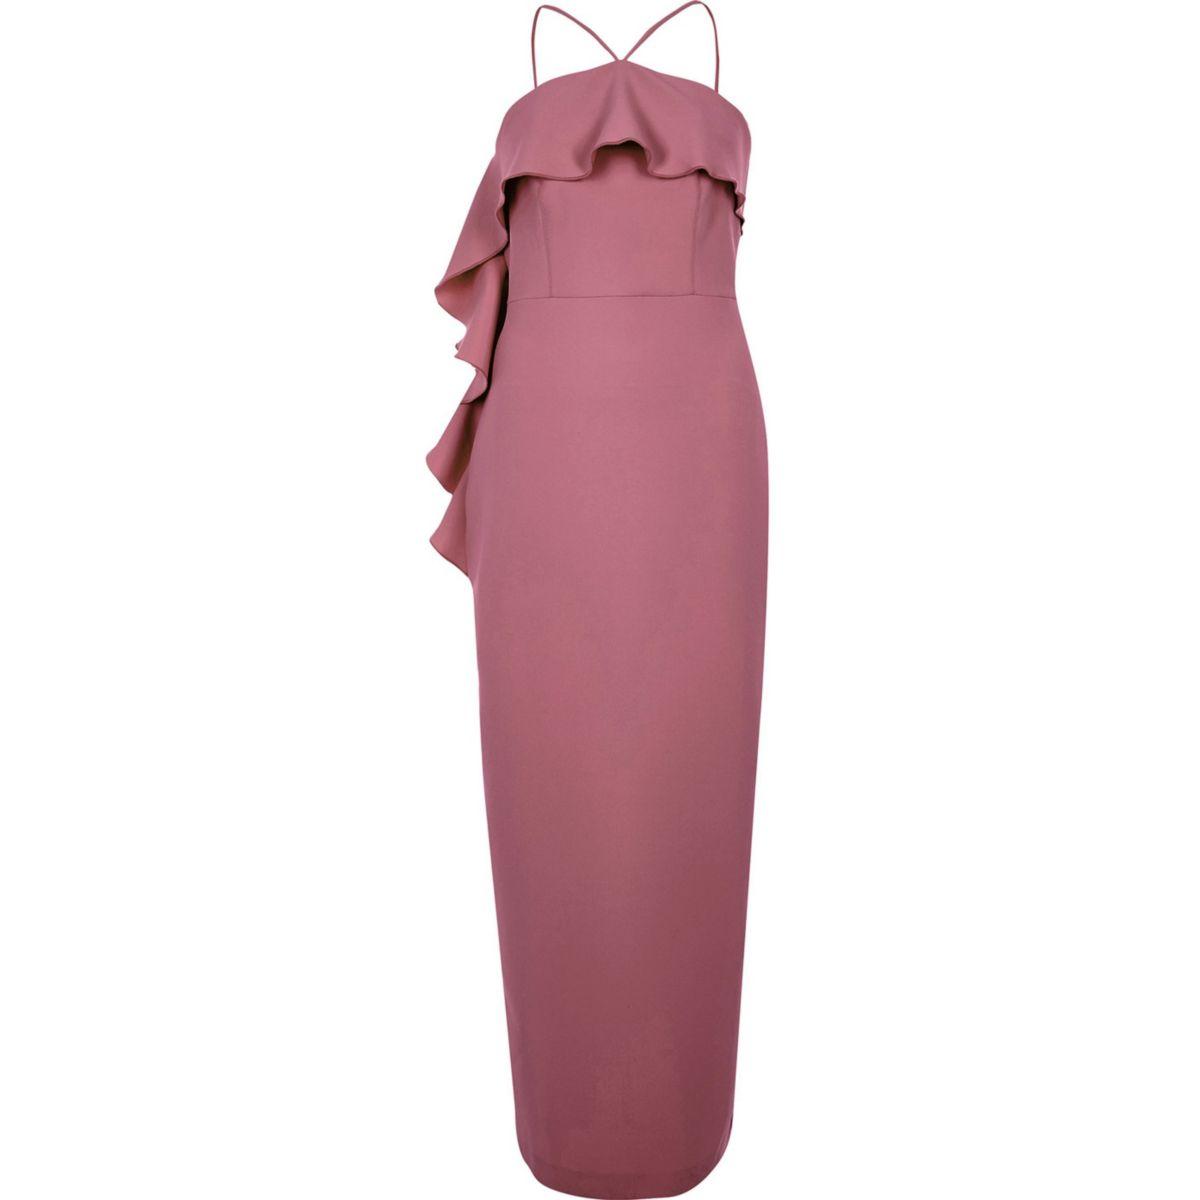 Dark pink cross neck frill bodycon dress